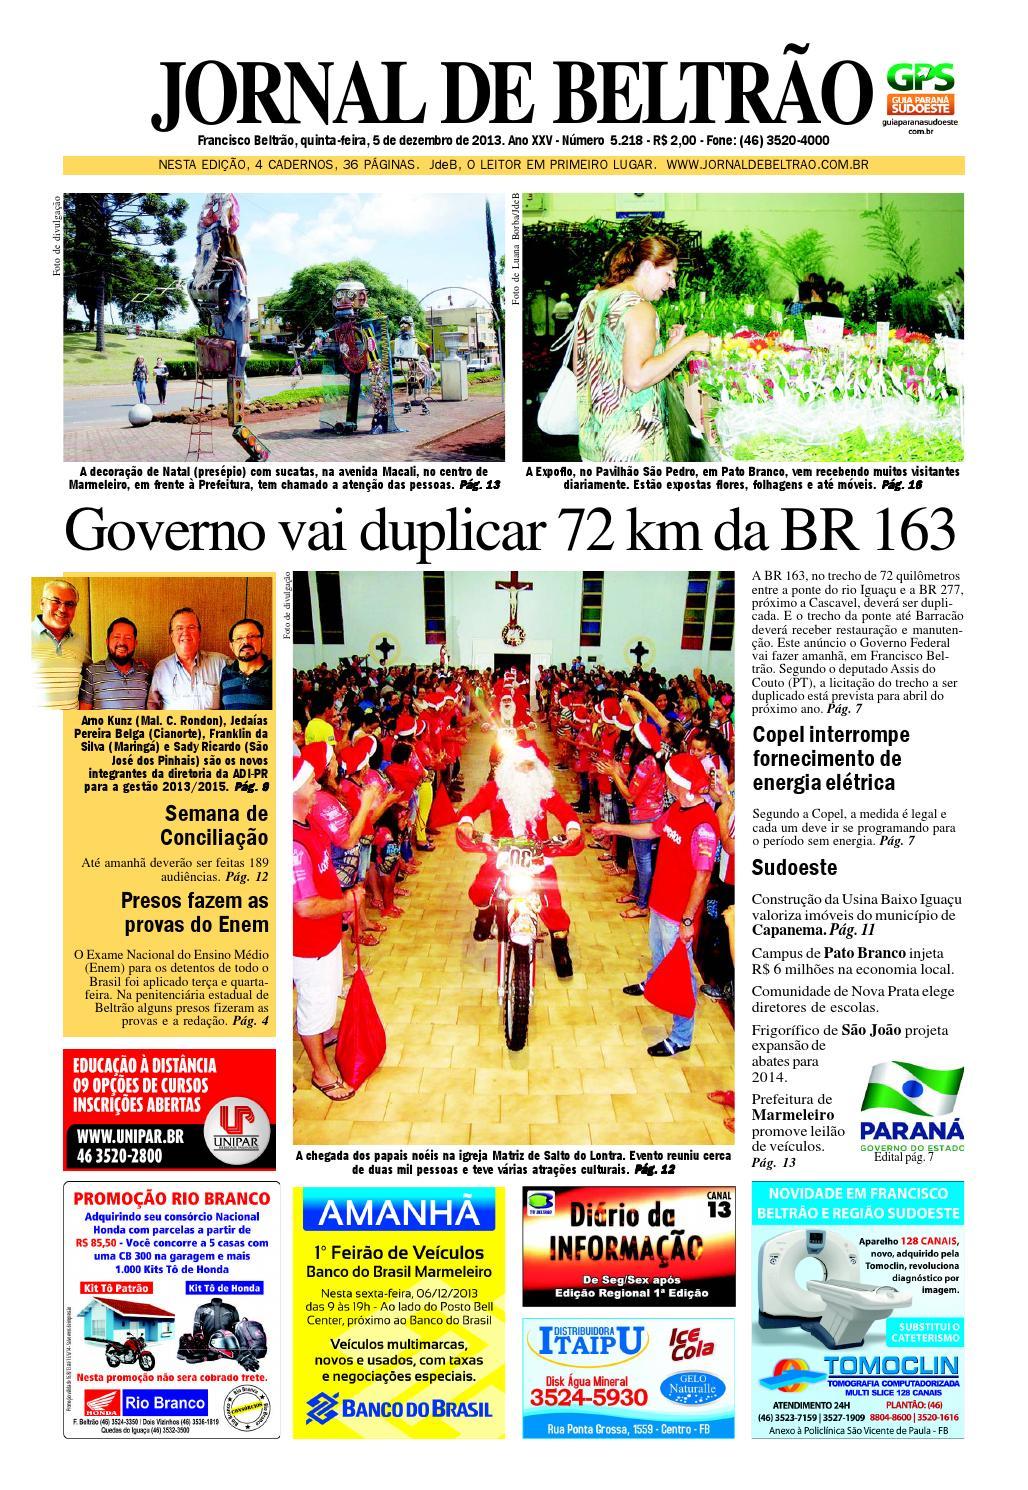 d5beeee73 Jornaldebeltrao 5218 05-12-2013.pdf by Orangotoe - issuu